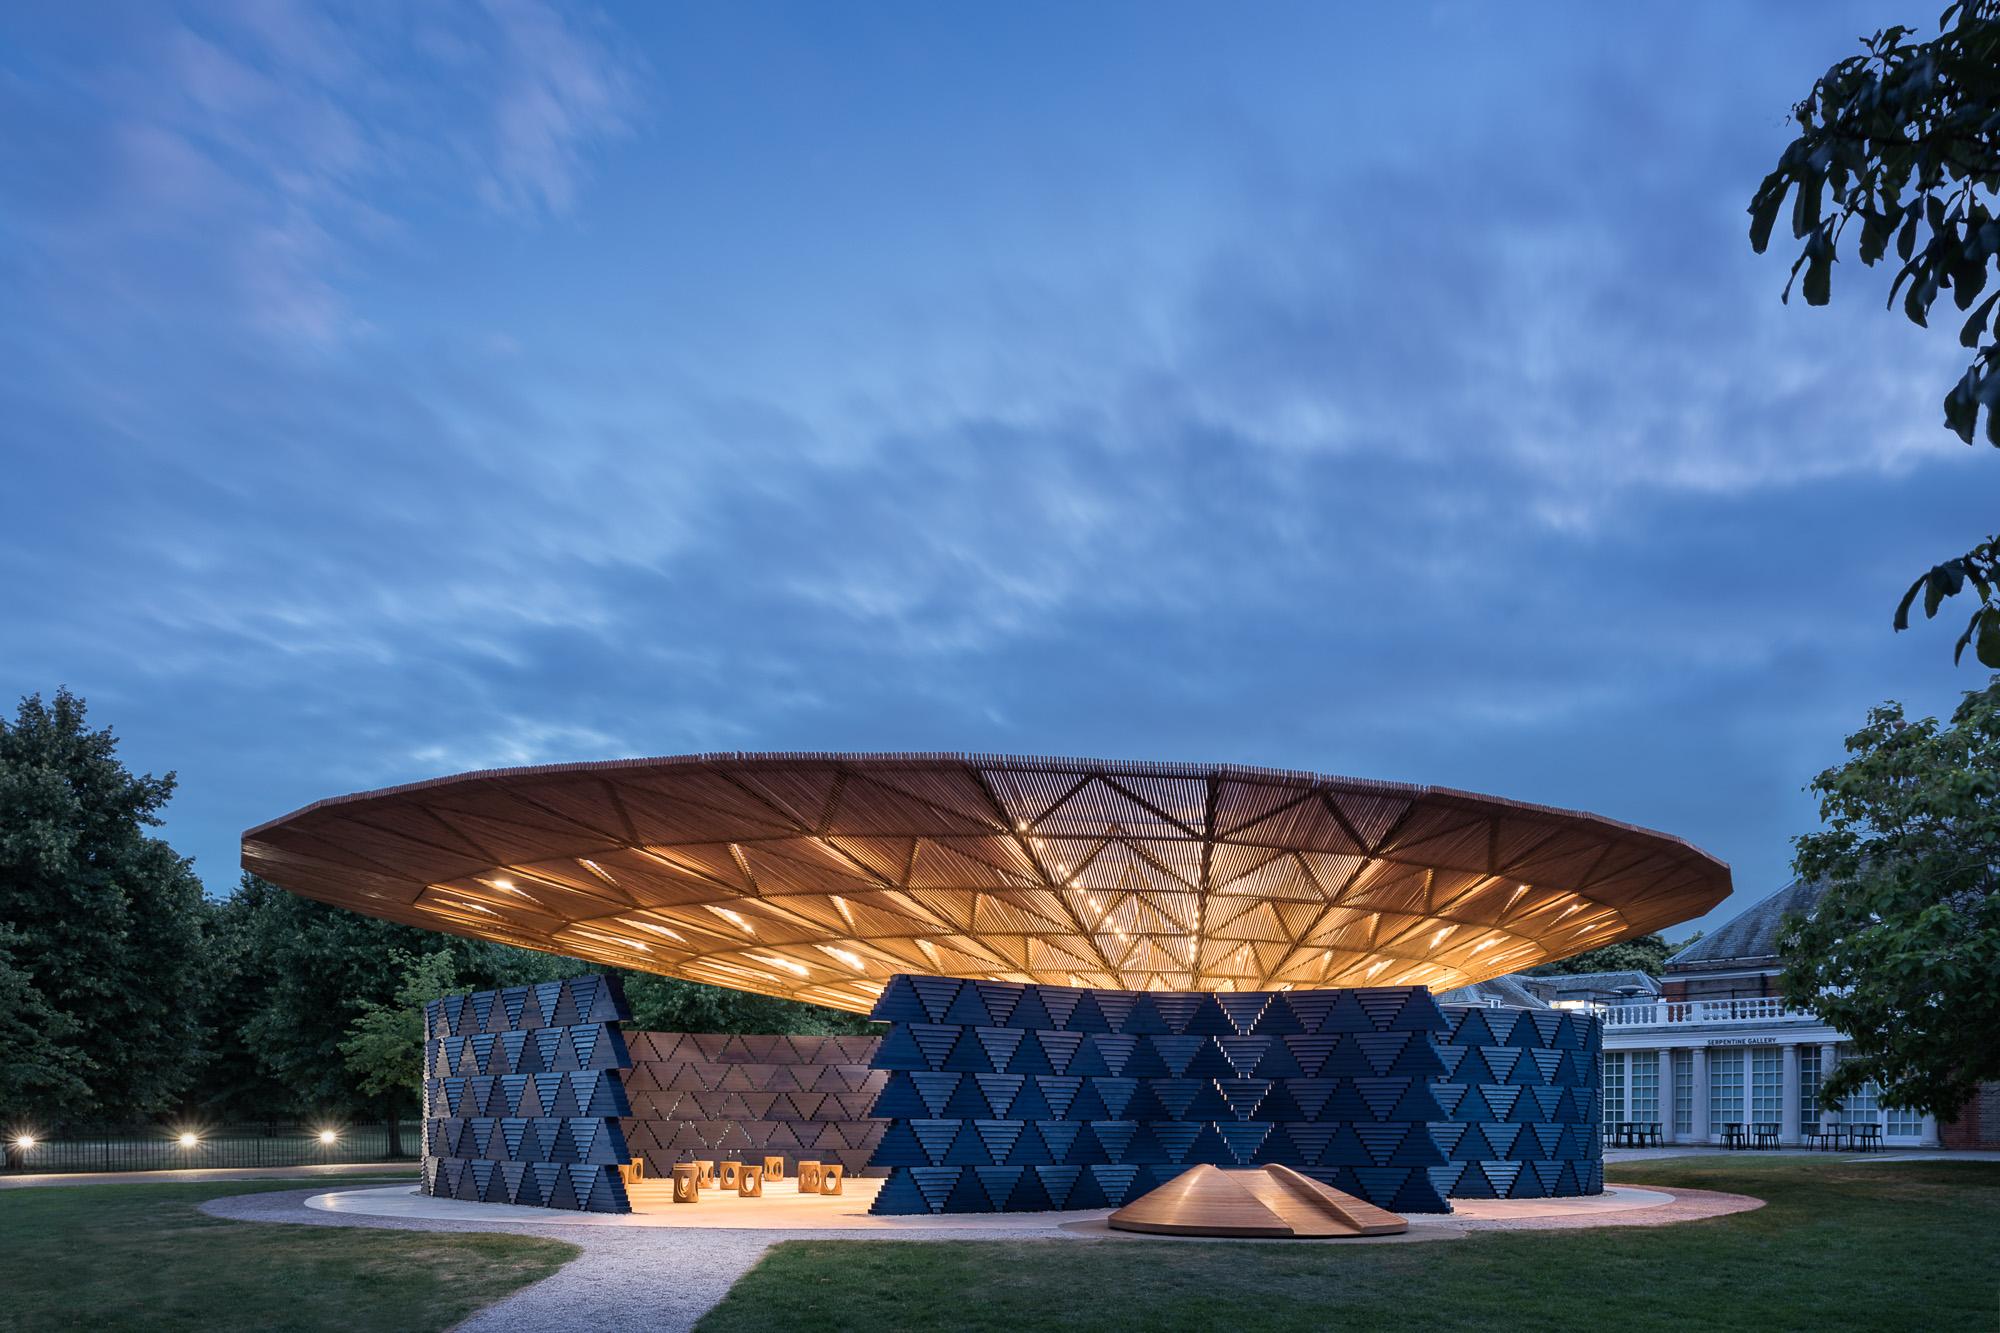 serpentine-pavilion-2017-architectural-photography